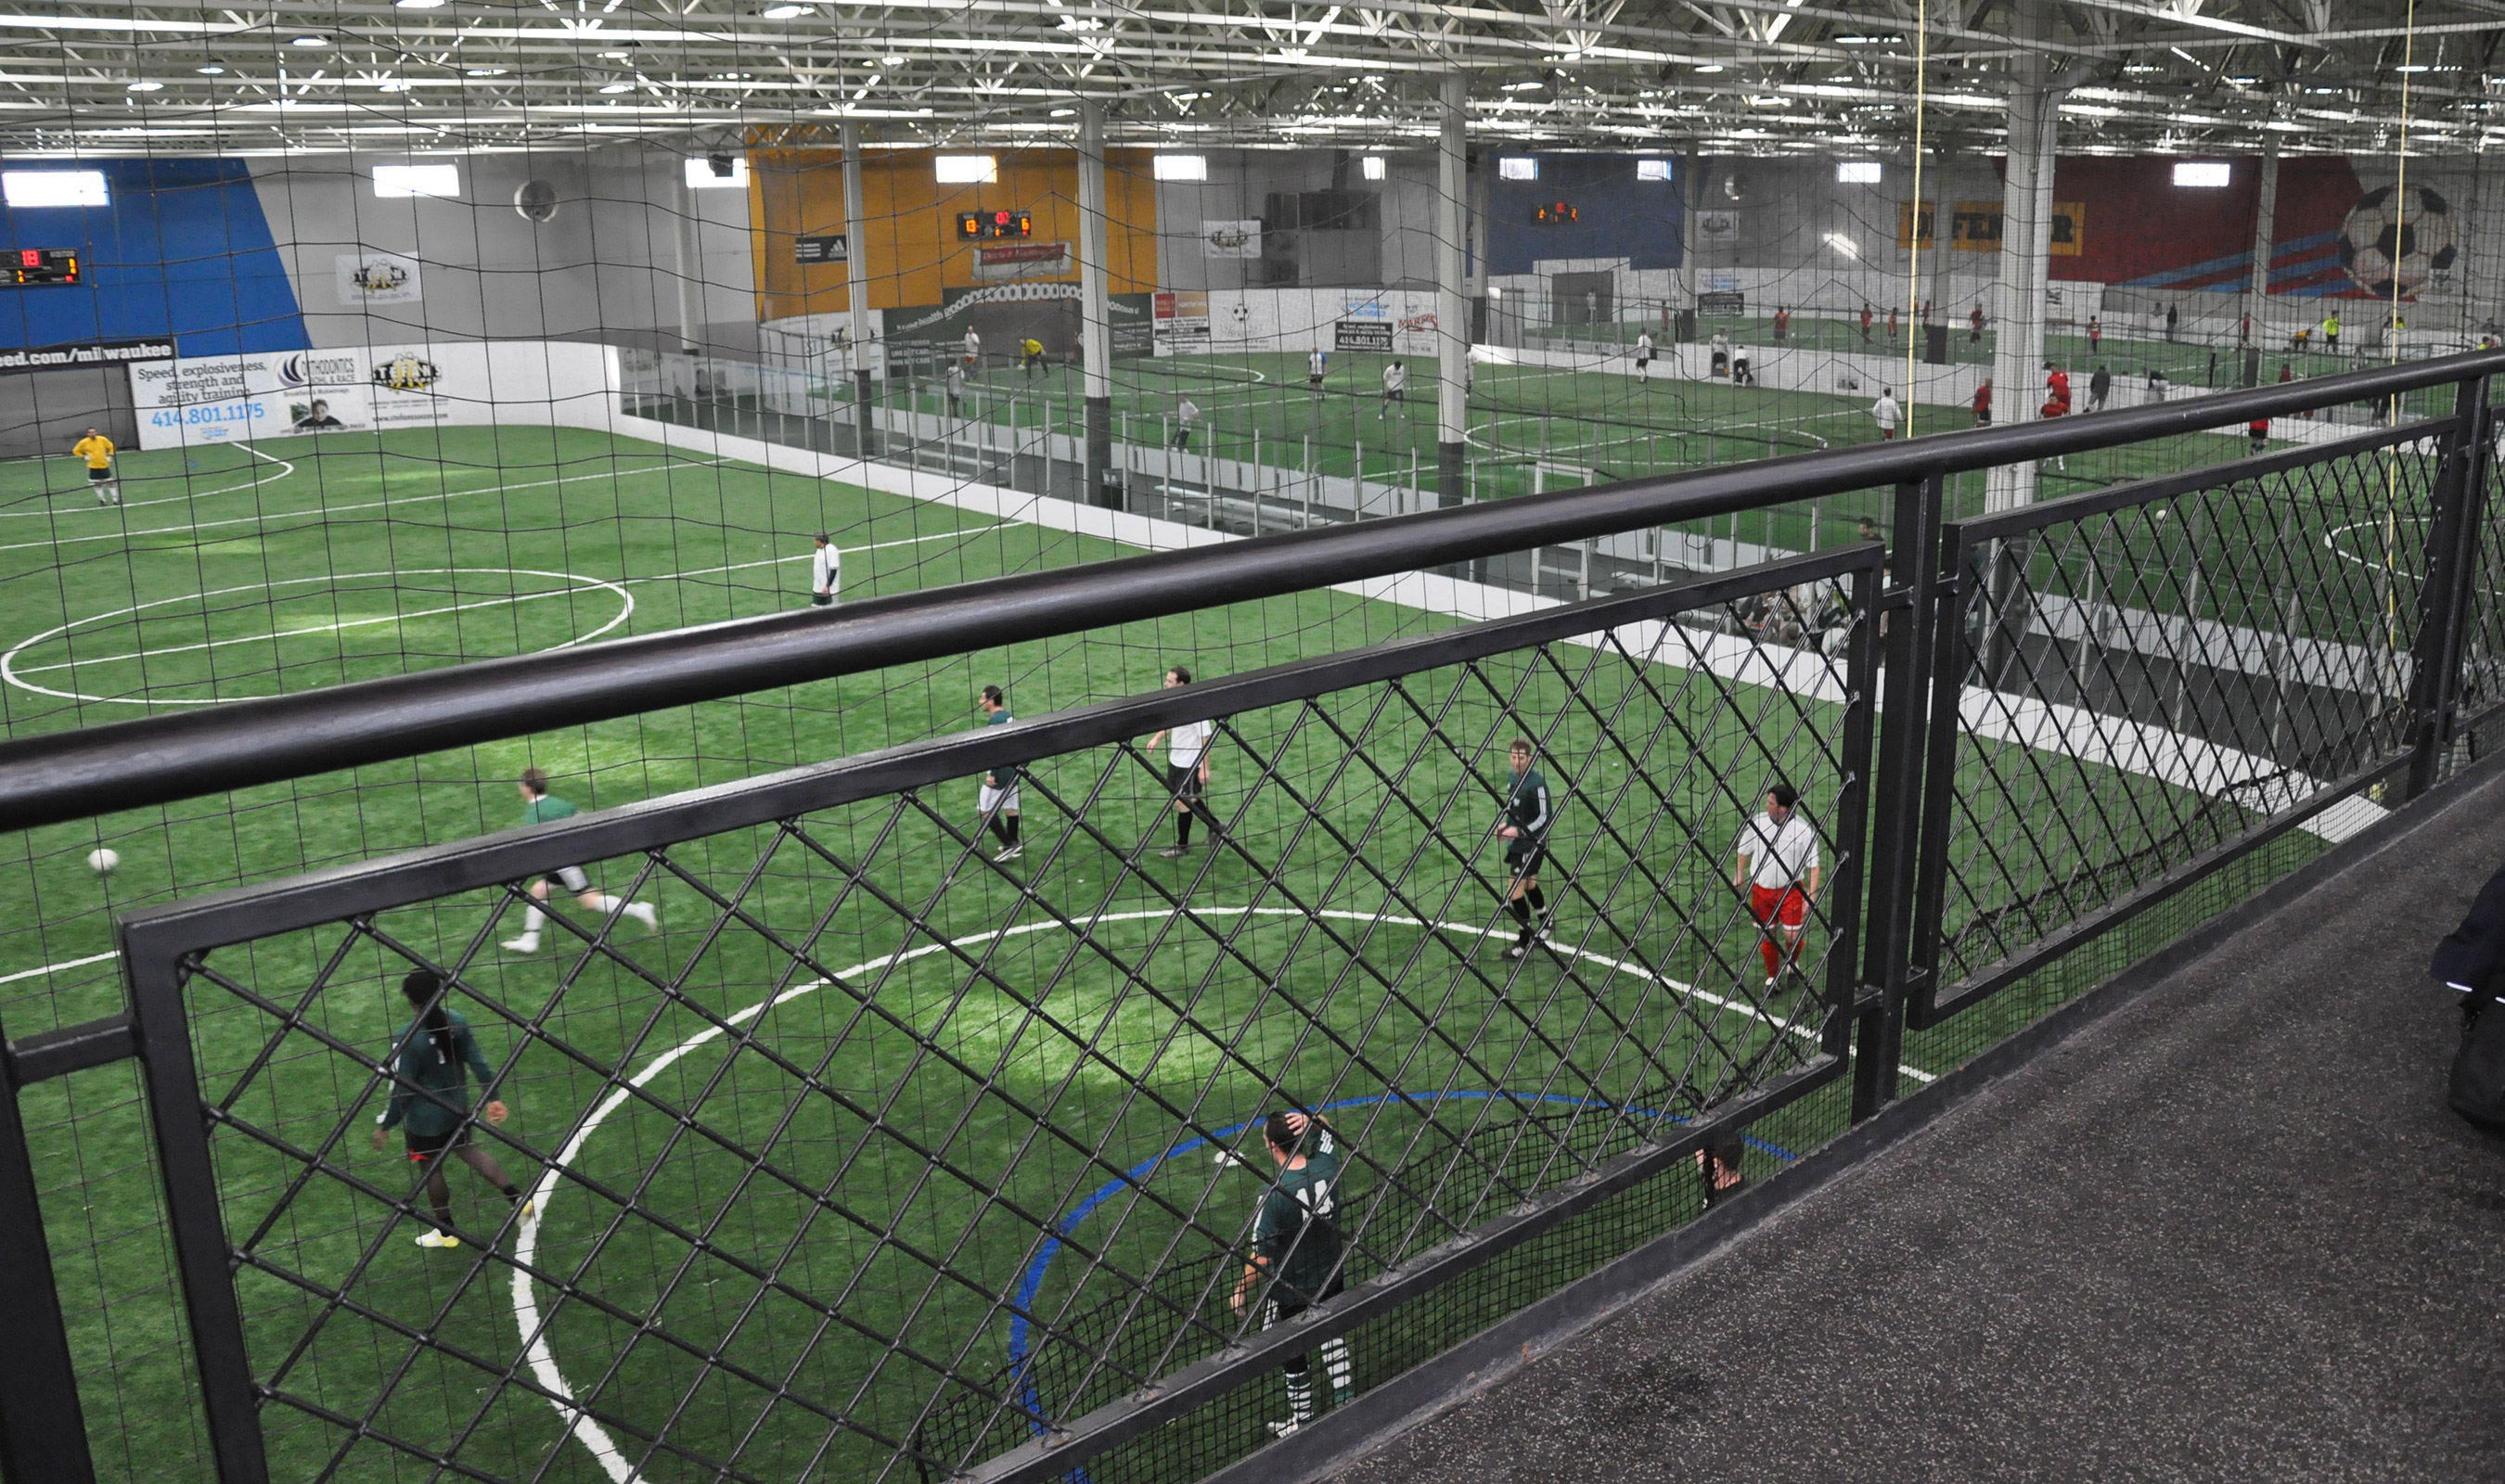 L-196 Brookfield Indoor Soccer